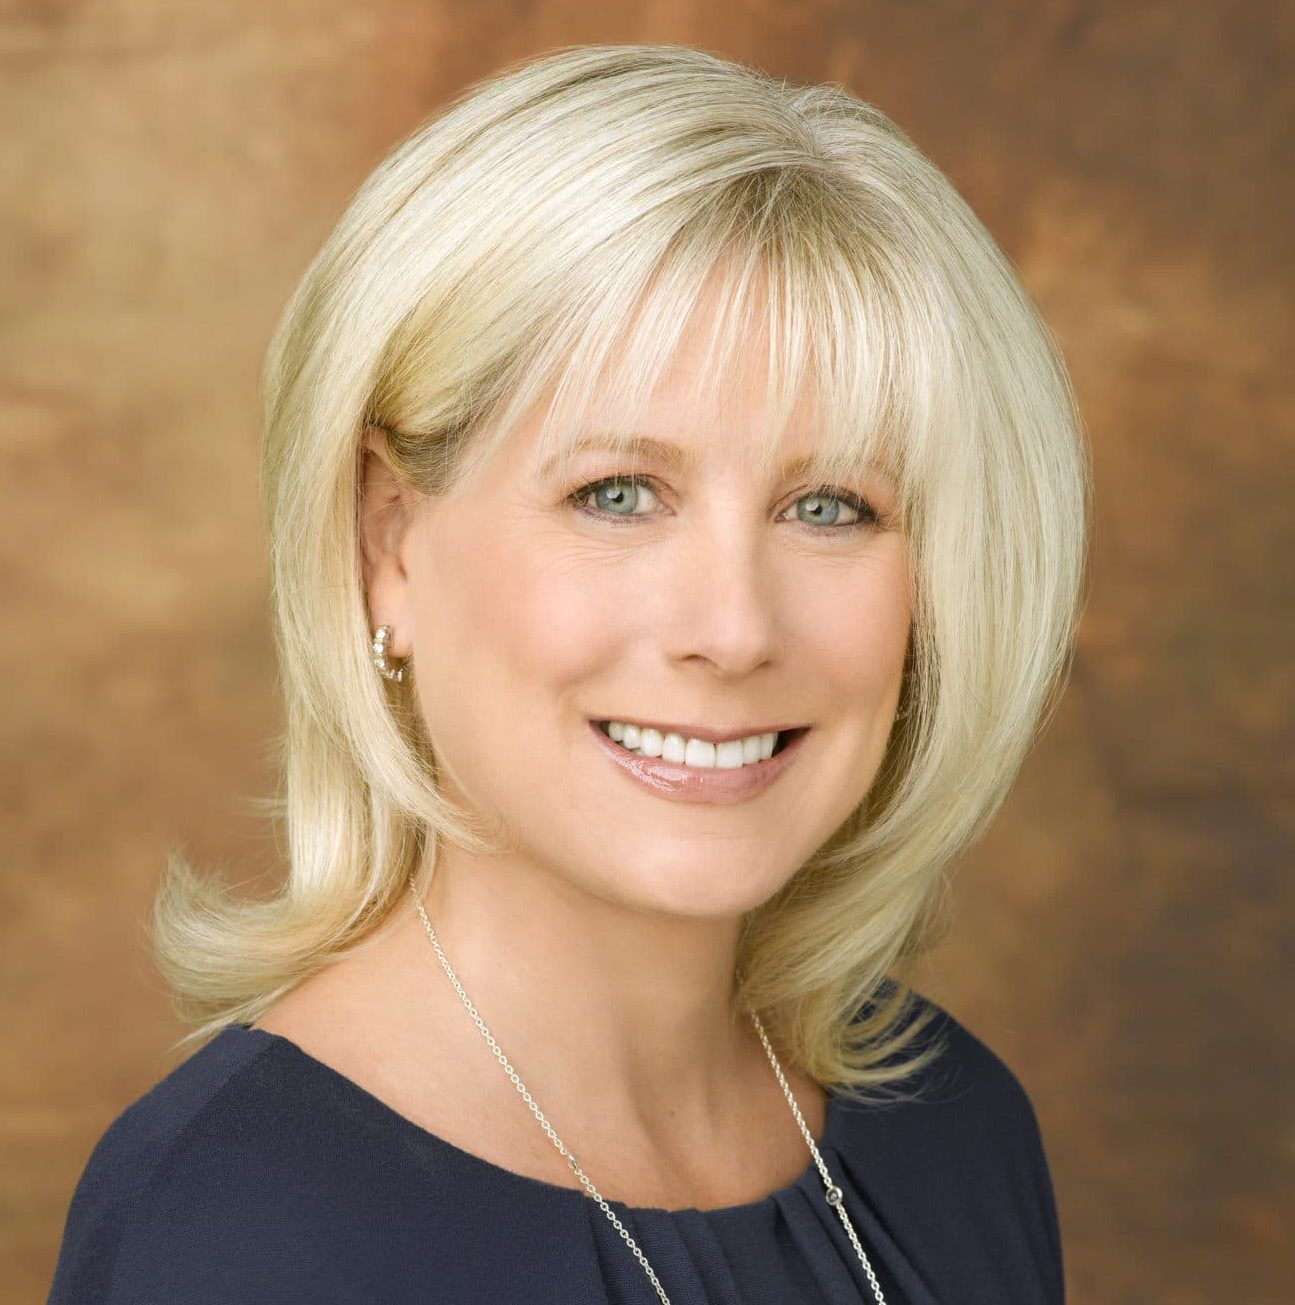 image-Rebecca-Campbell-chairman-of-Disneys-Direct-to-Consumer-International-segment.-mediabrief-scaled.jpg